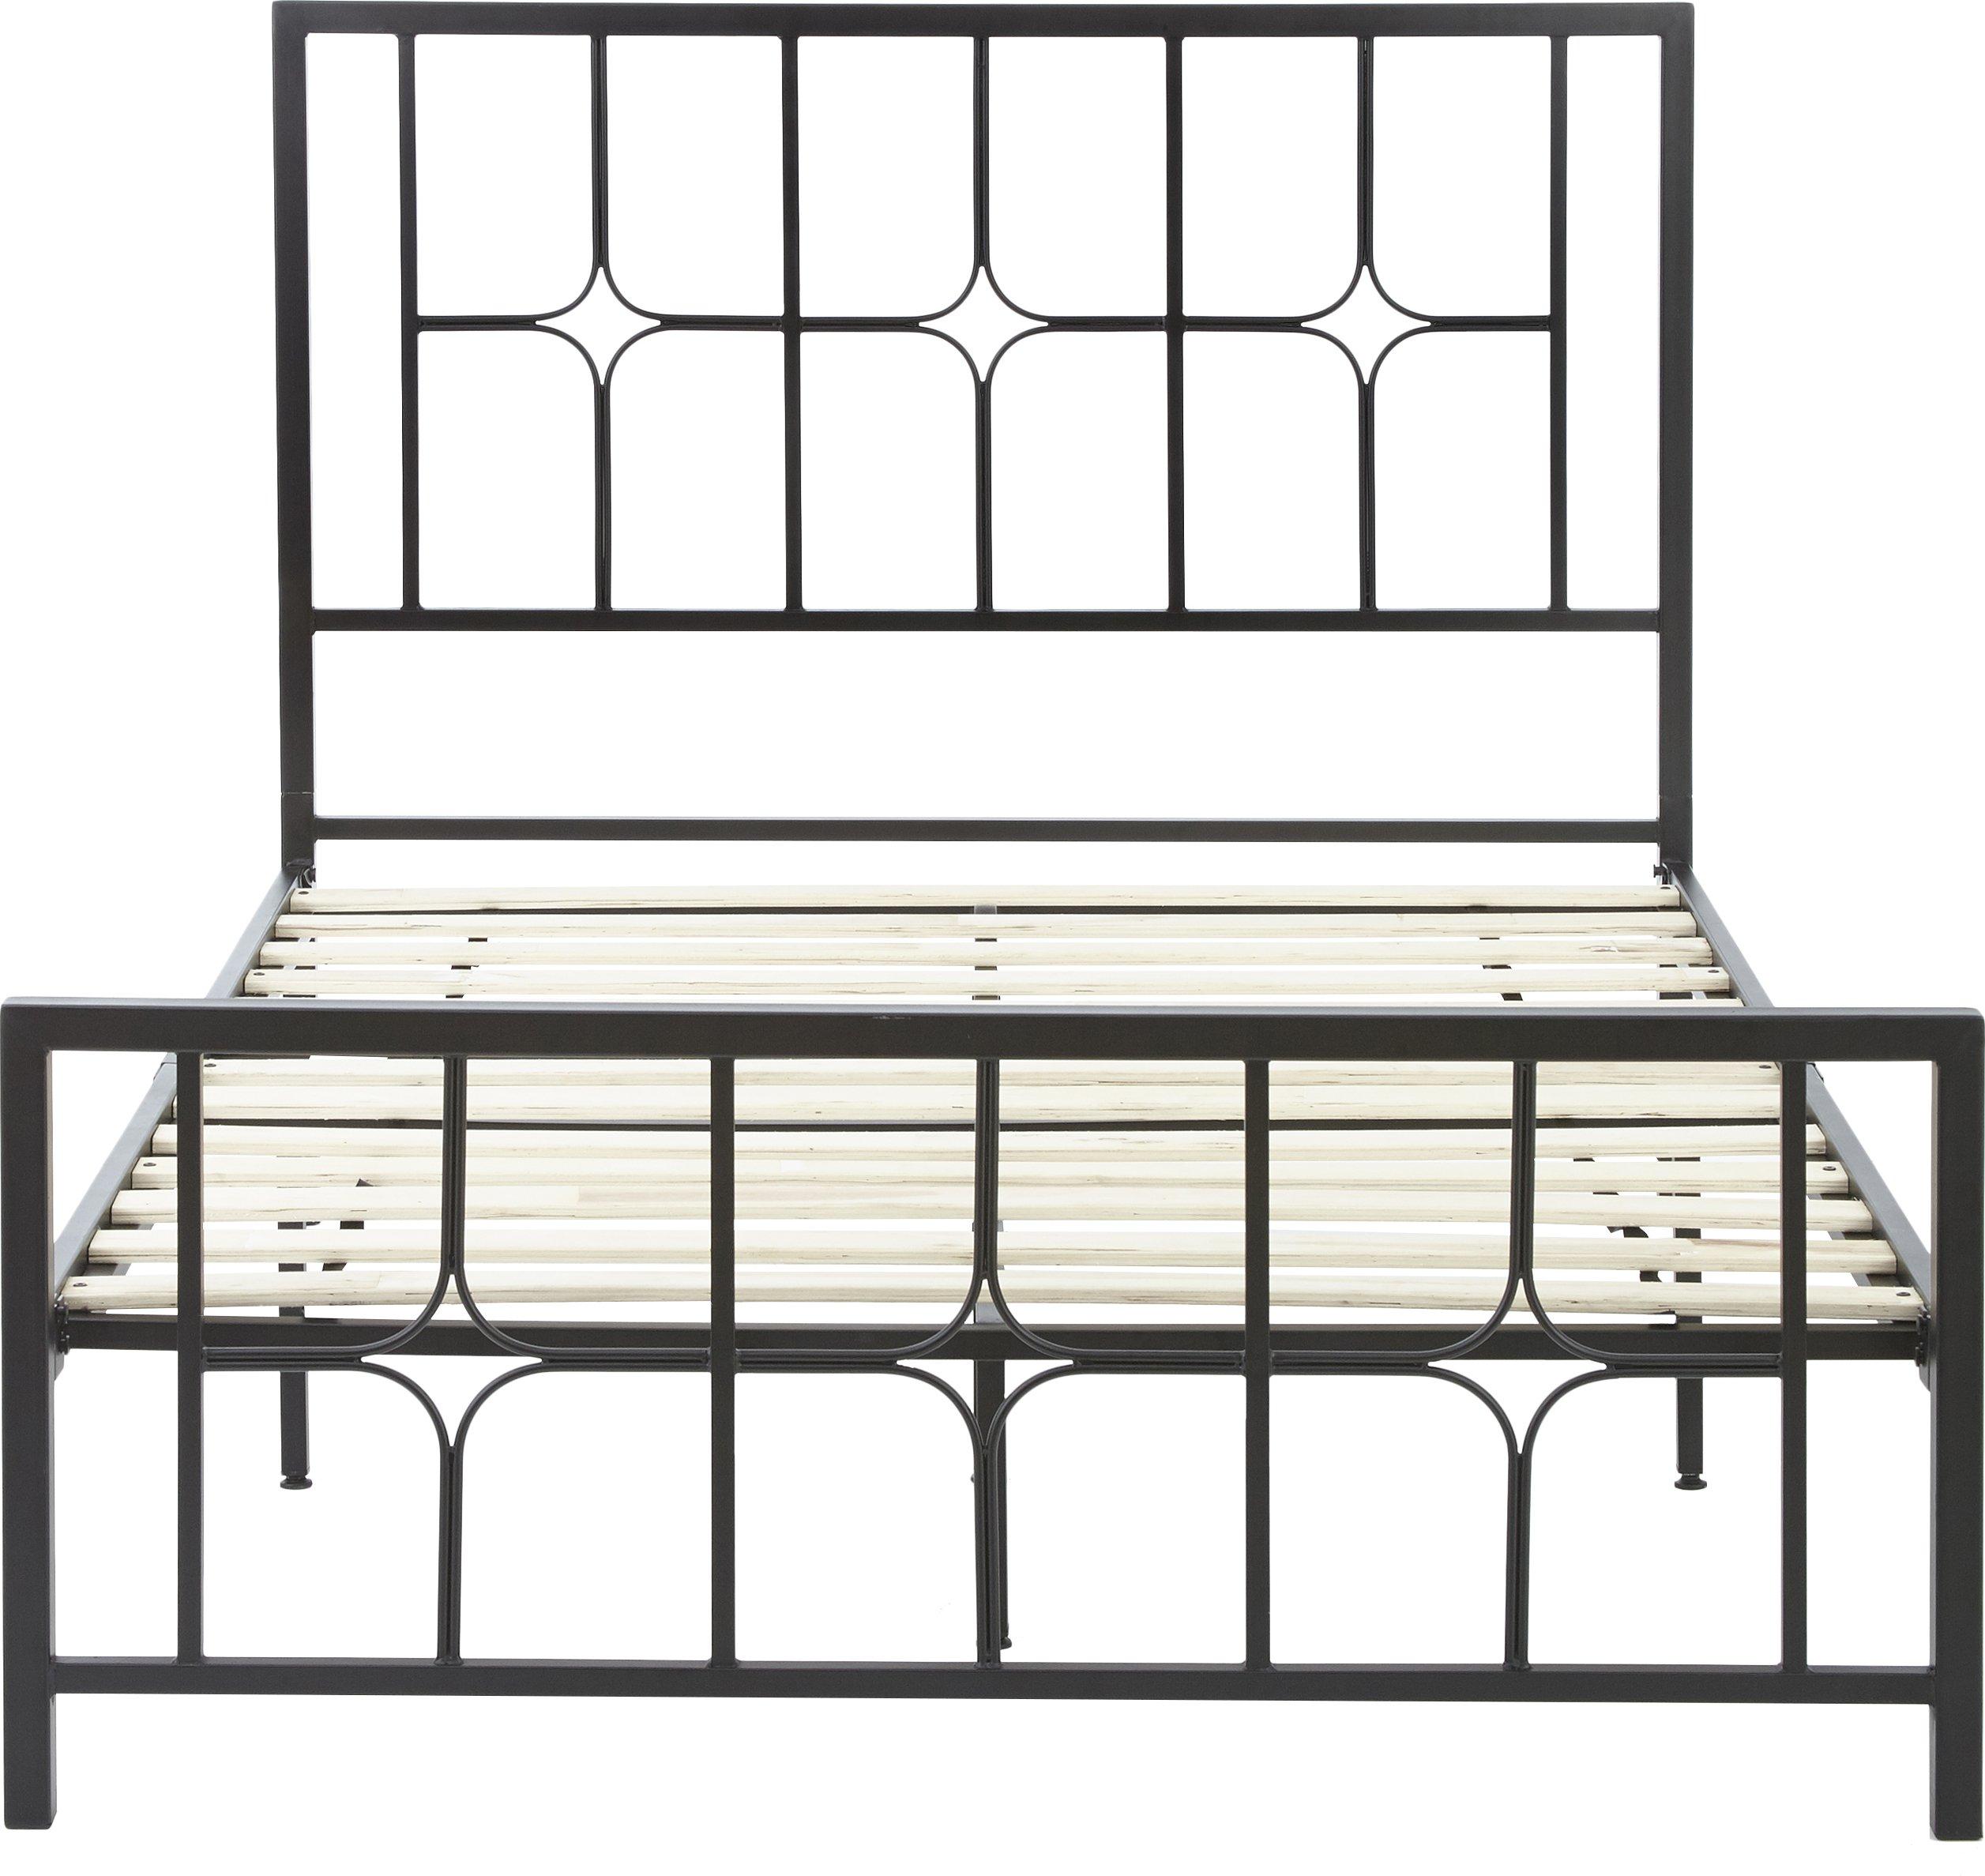 Flex Form Lydia Metal Platform Bed Frame / Mattress Foundation with Headboard and Footboard, King by Flex Form (Image #5)